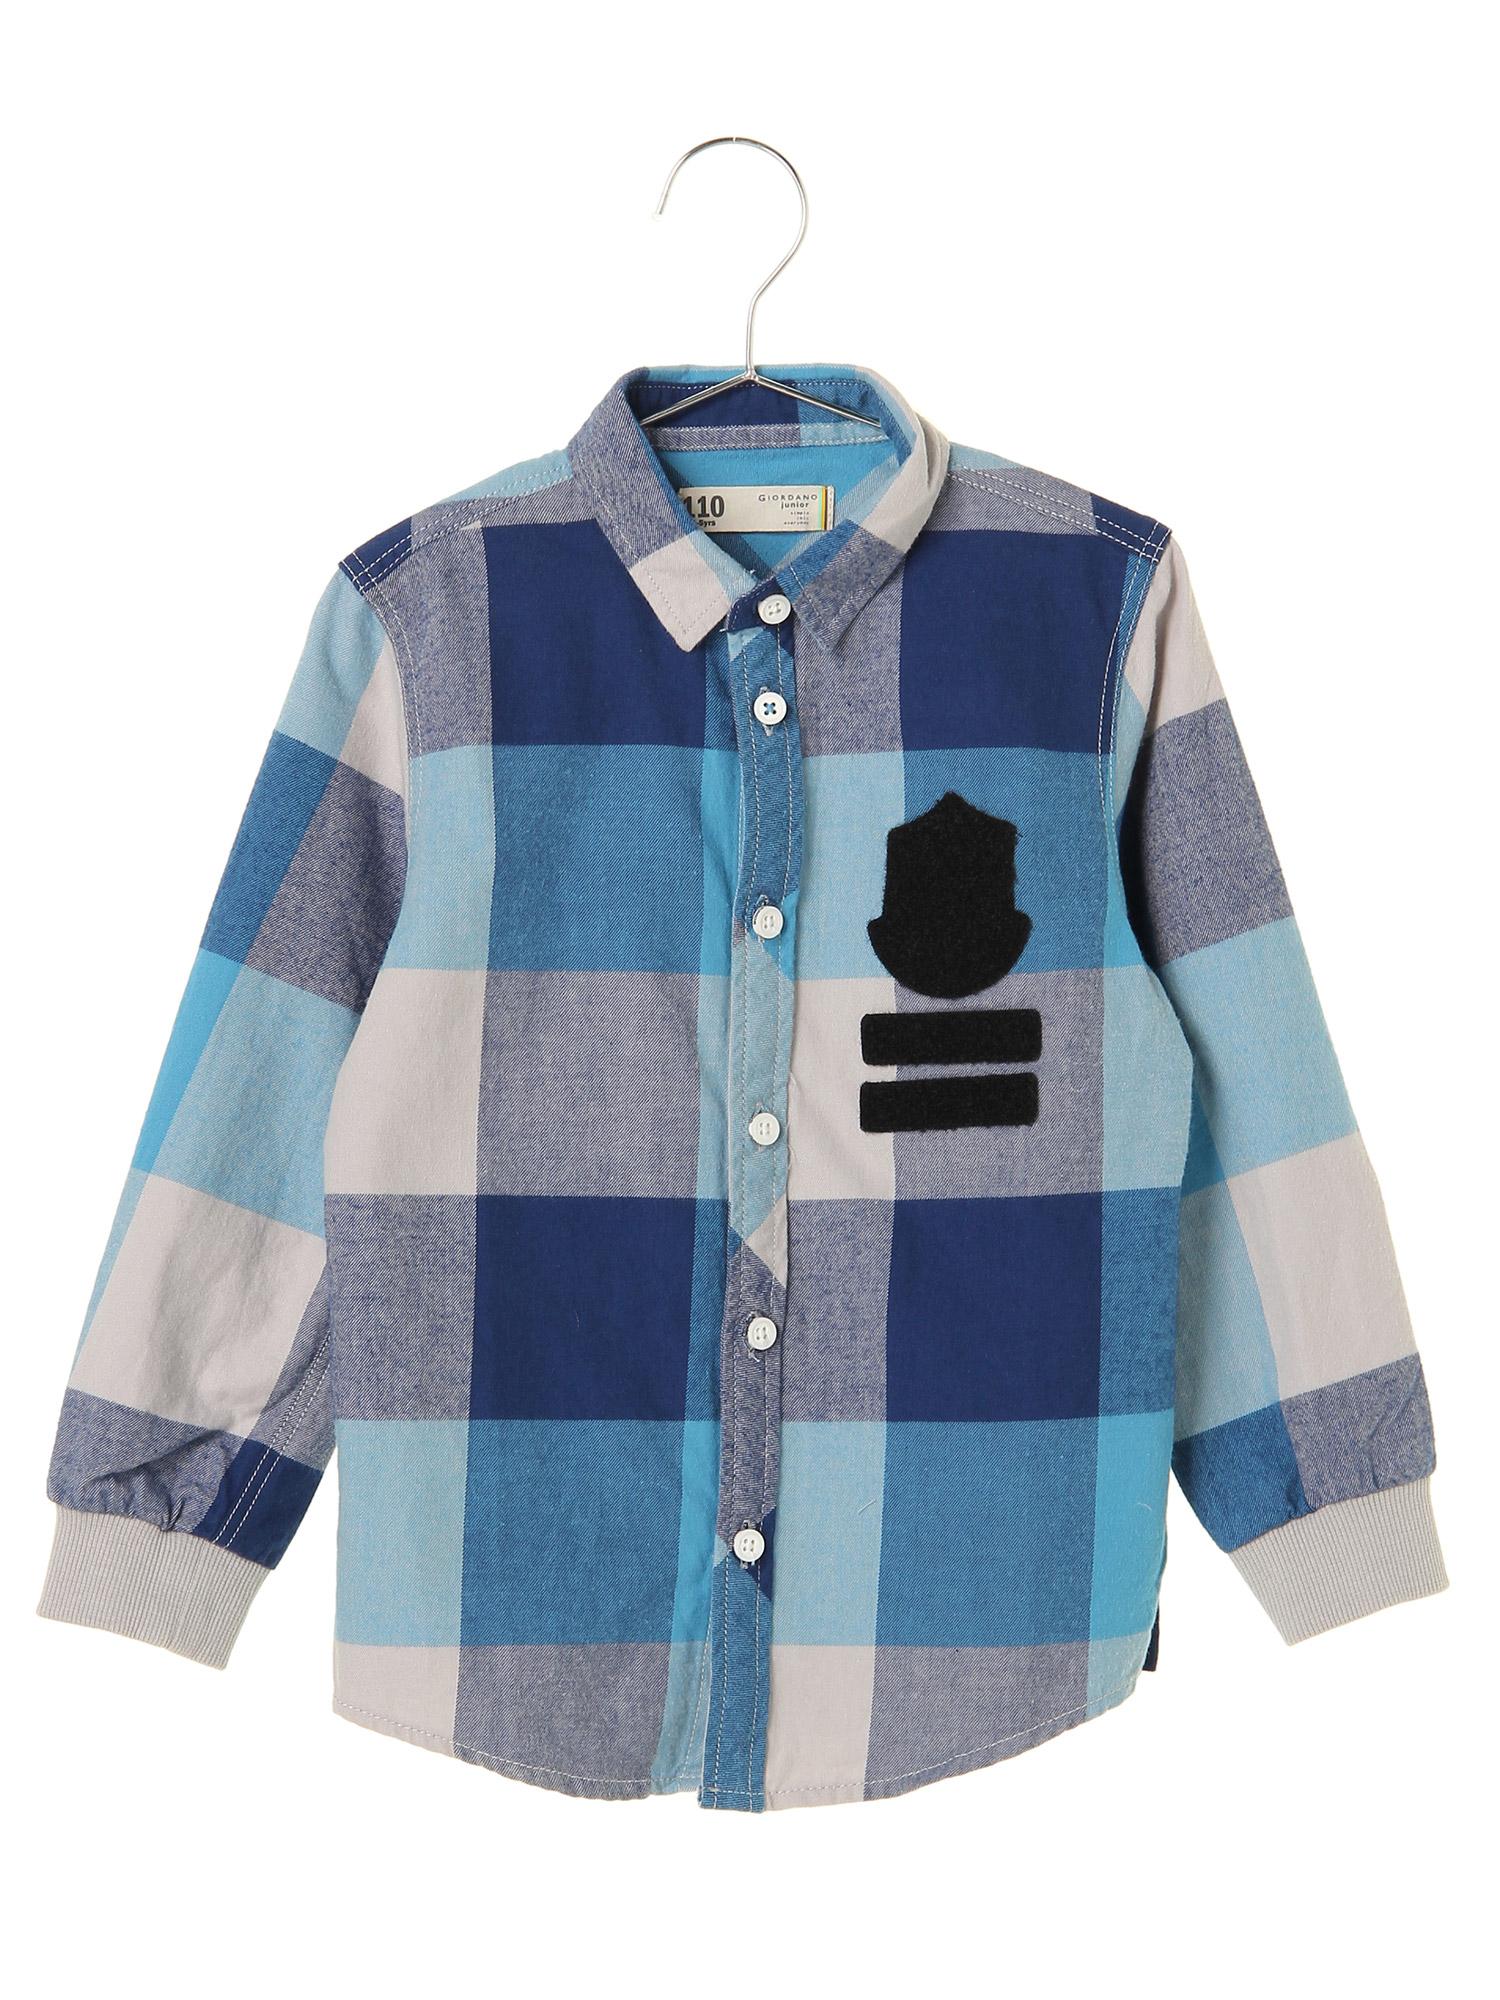 [GIORDANO]ワッペン付きフランネルチェックシャツ